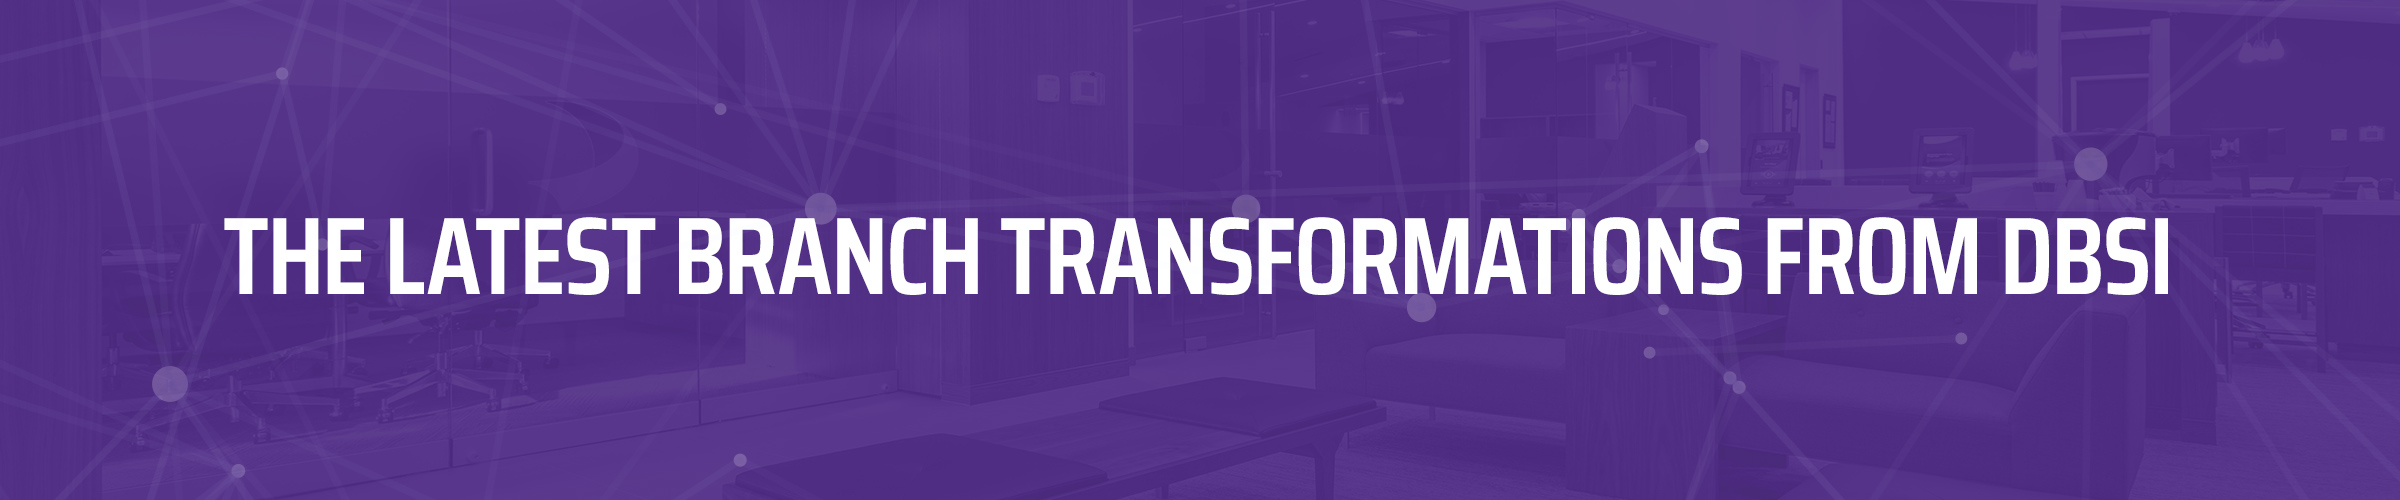 Q2-19, DBSI 2400x500 Top 10 Branch Transformations LP Header